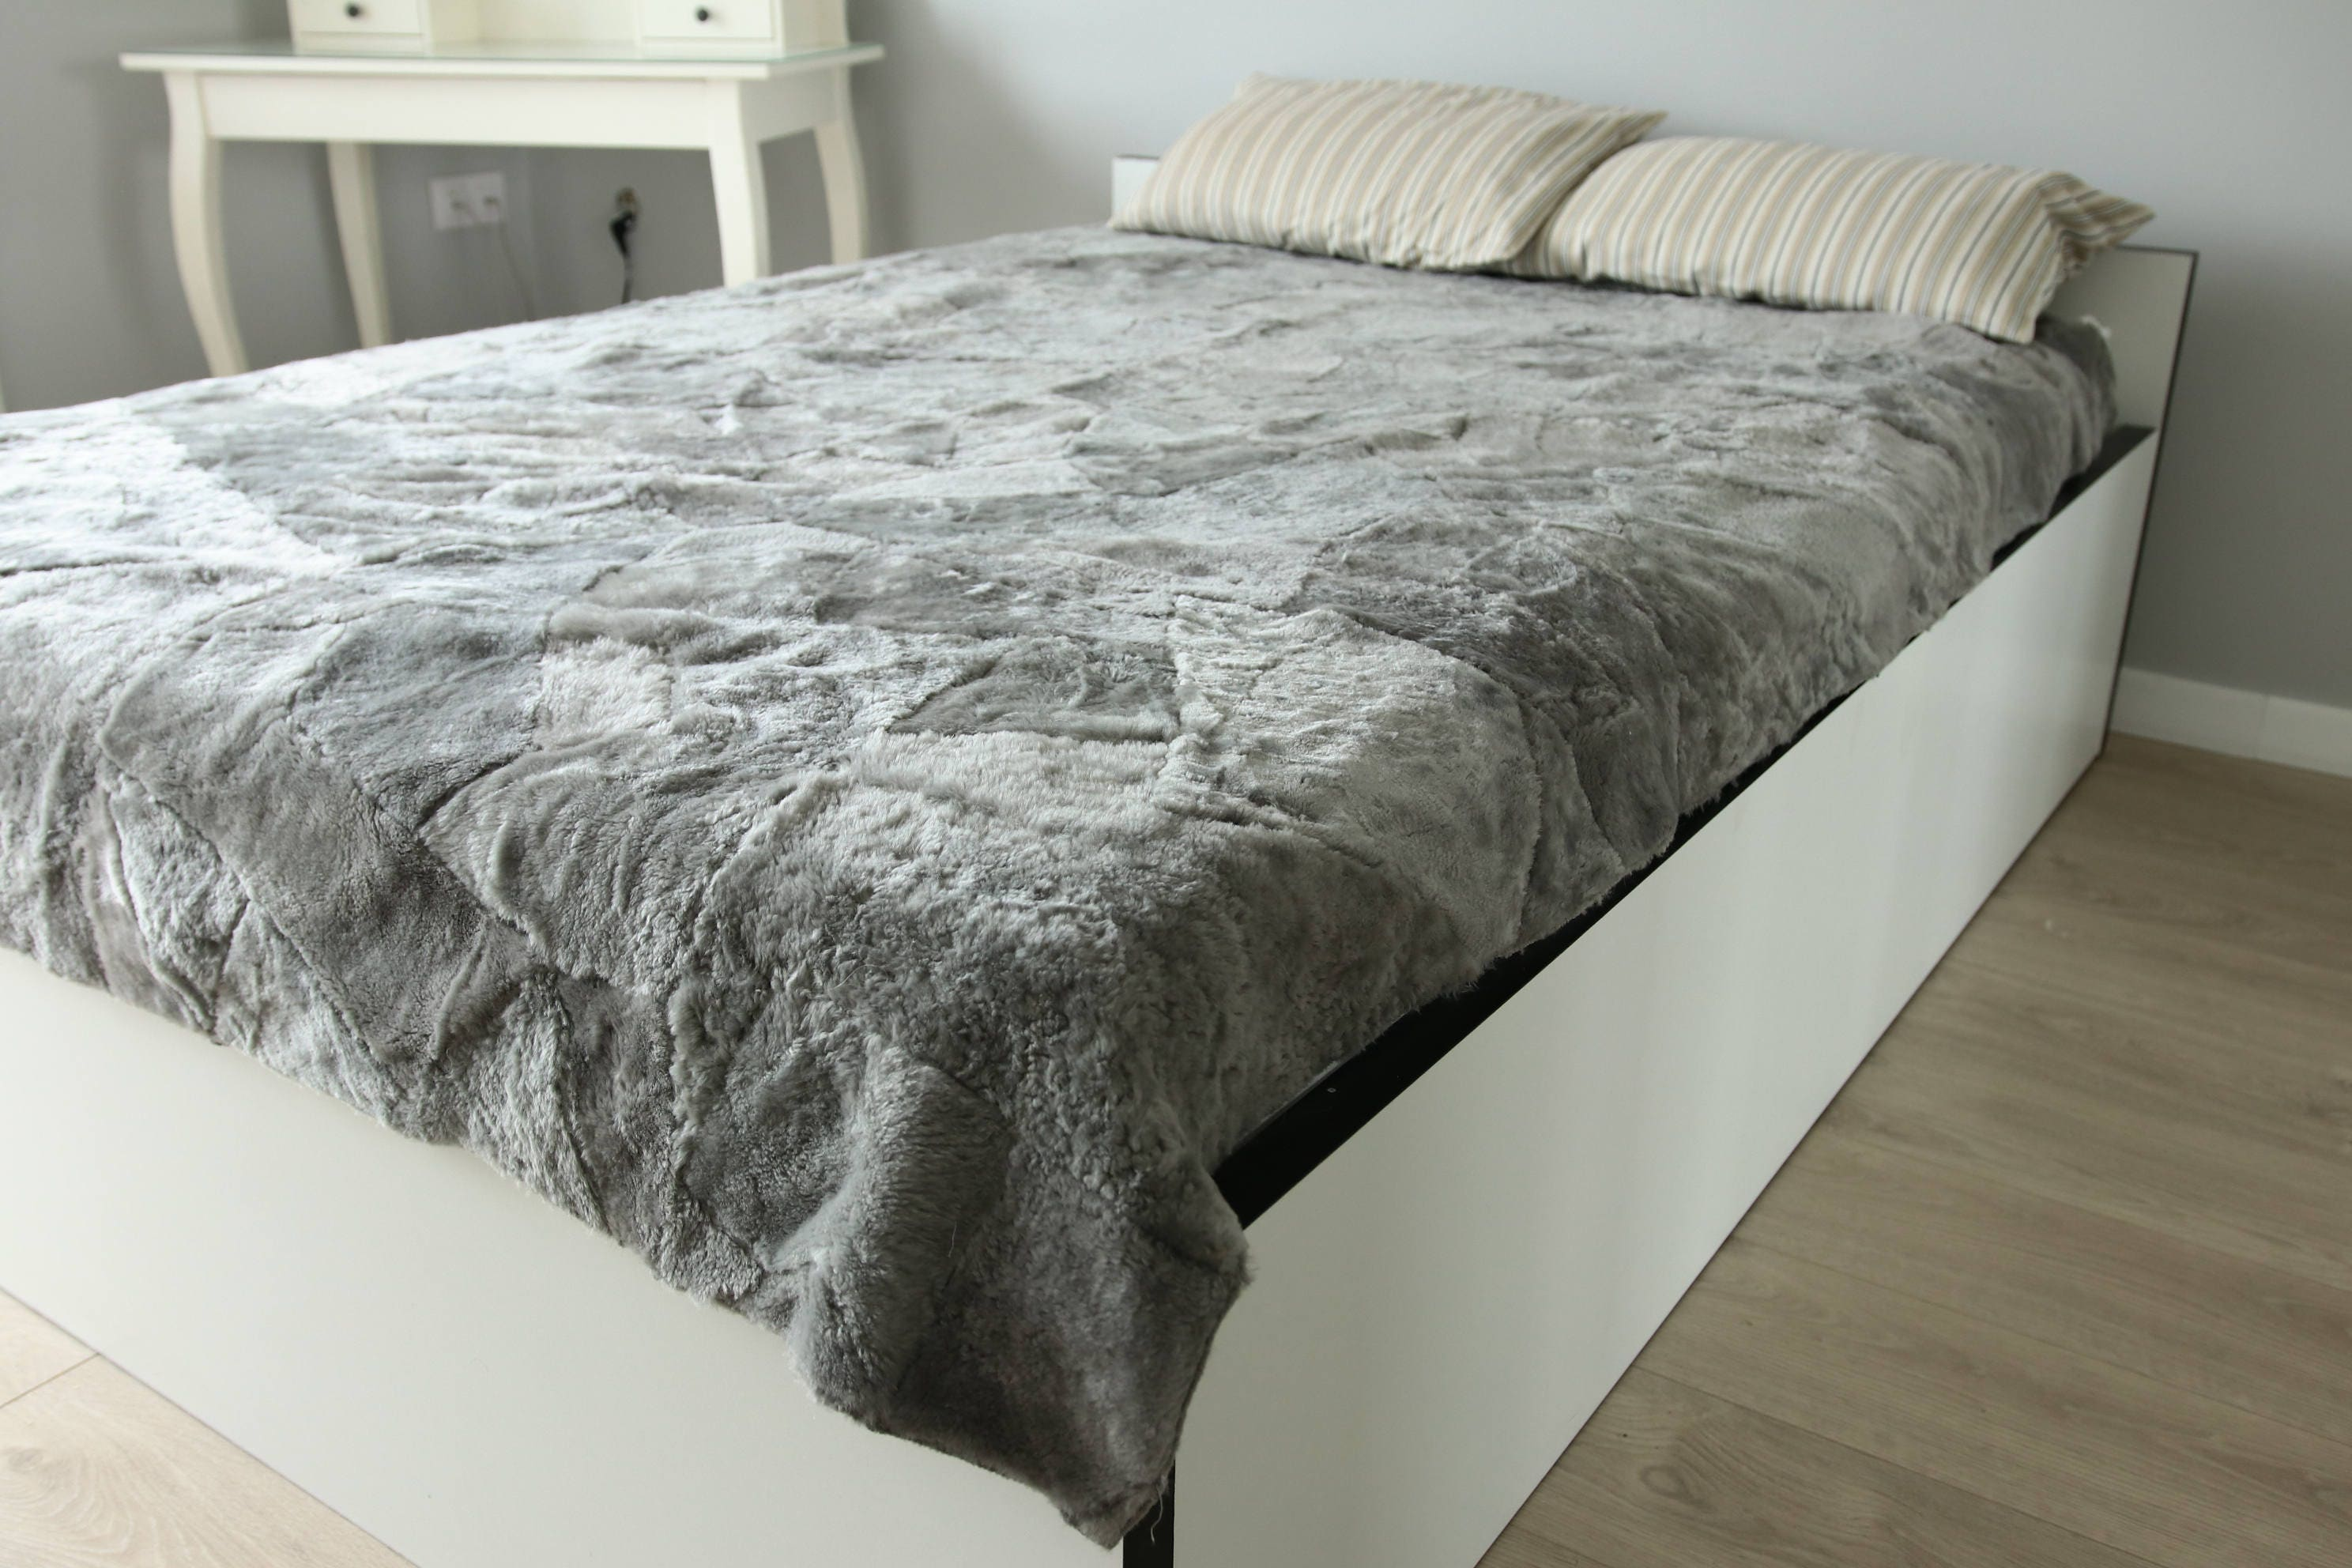 ON SALE Sheepskin Throw | Brown Bed Throw | Brown Throw | Sofa Throw | Gray  Throw | Sheepskin Area Rug | Gray Sheepskin Rug